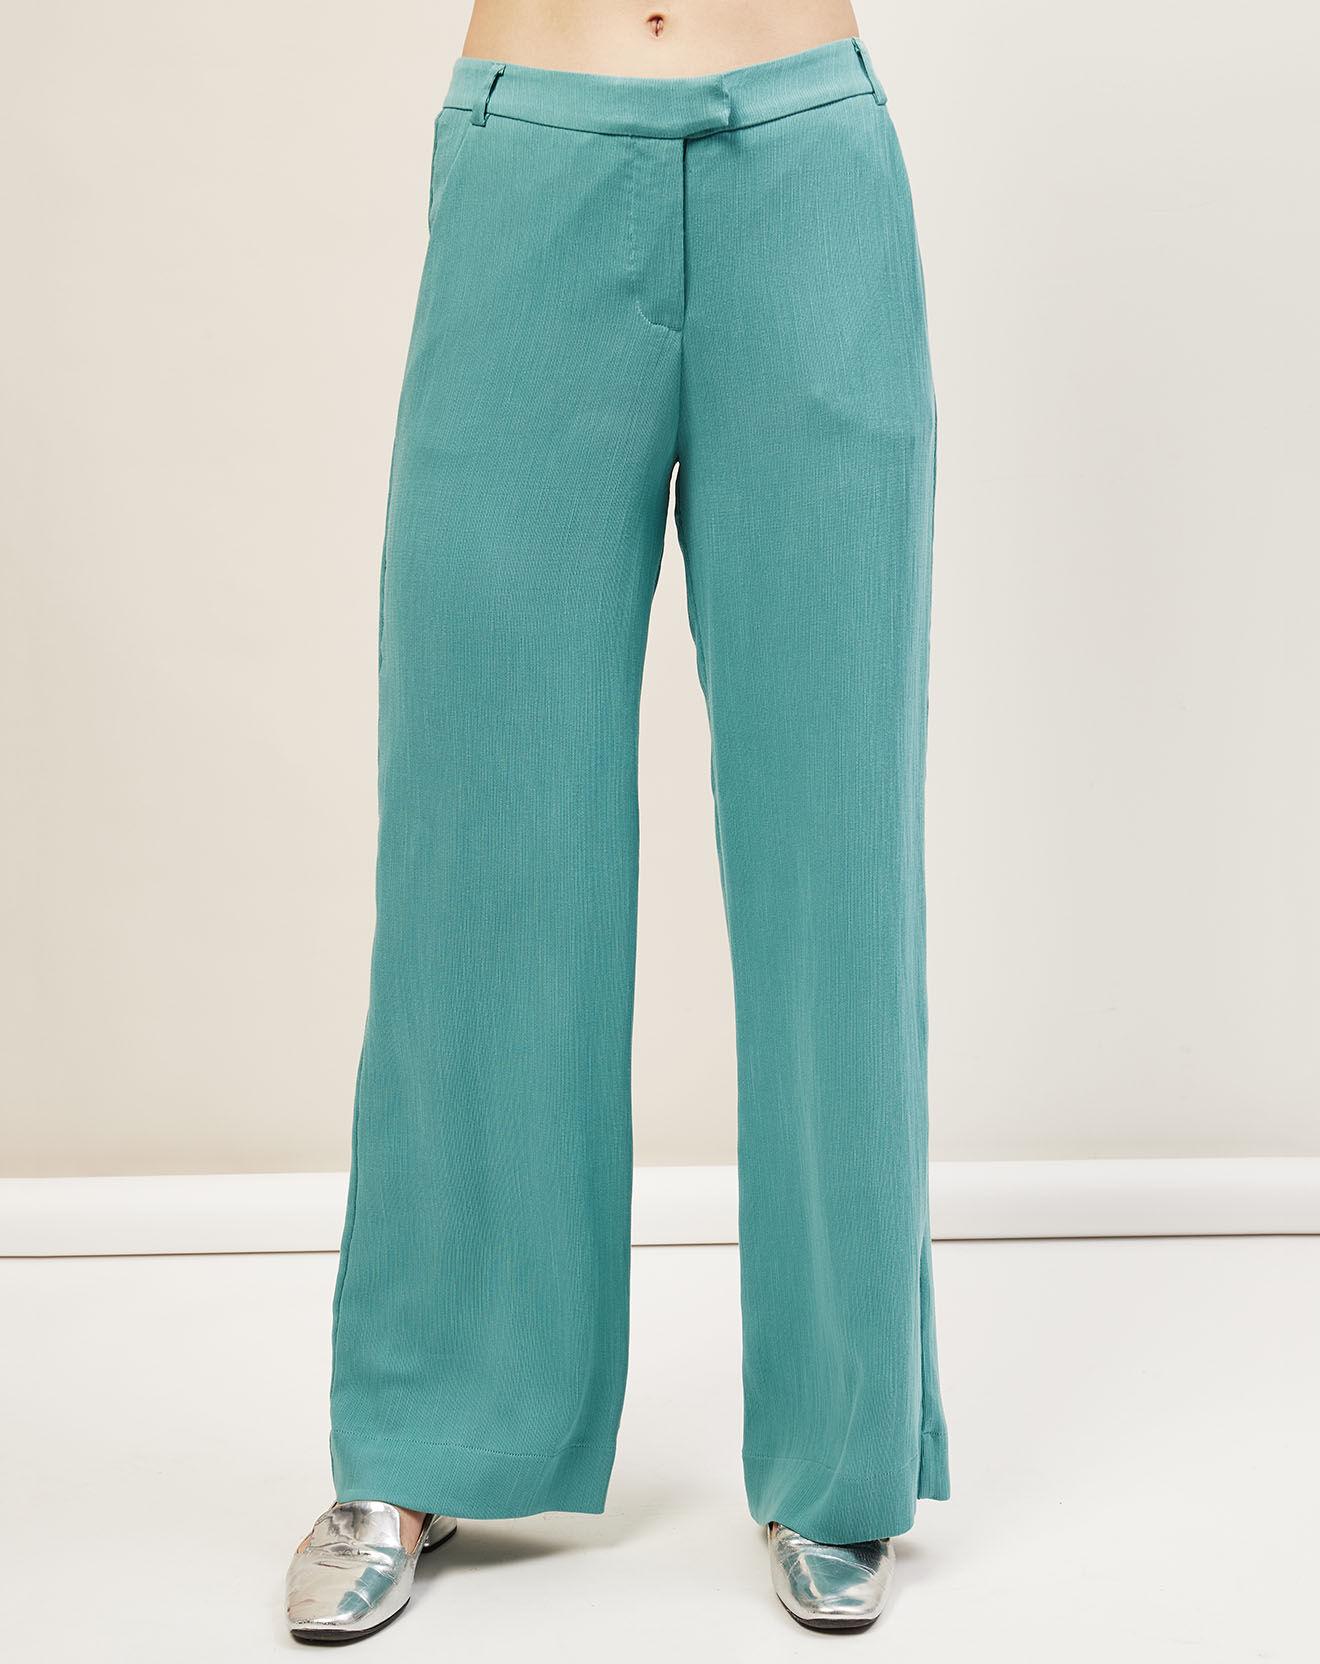 Pantalon Many bleu turquoise - Cop Copine - Modalova